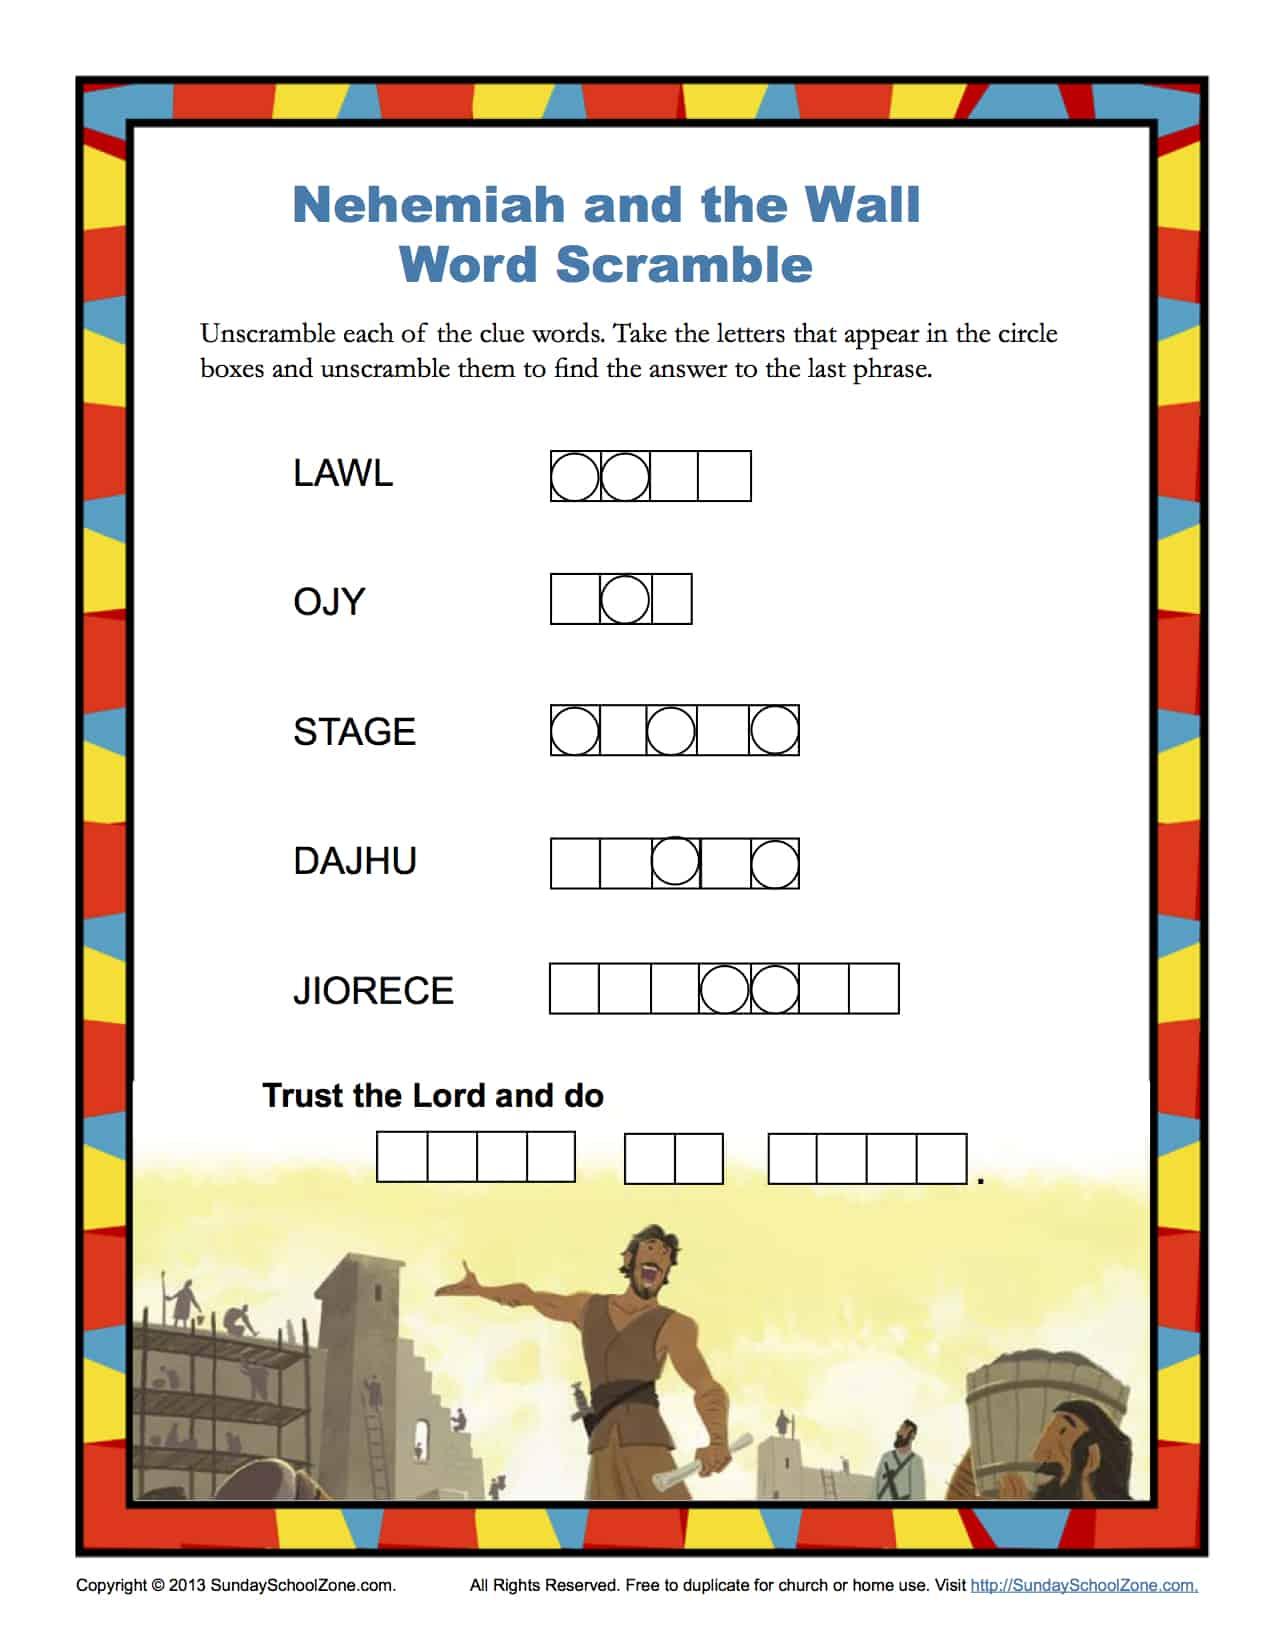 Nehemiah and the Wall Word Scramble Children 39 s Bible